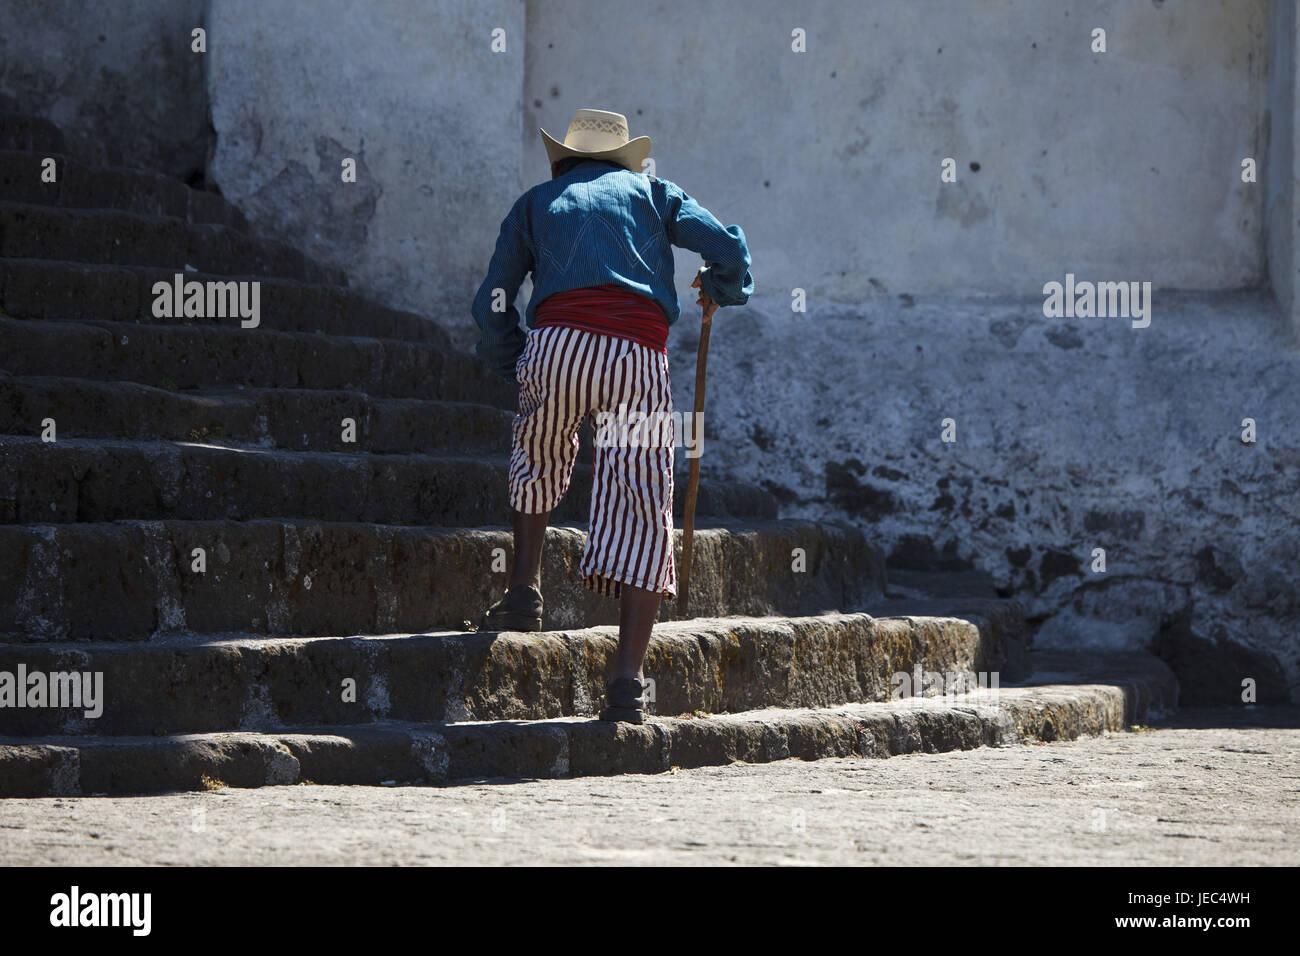 Guatemala, Atitlan lake, man, Maya, no model release, - Stock Image